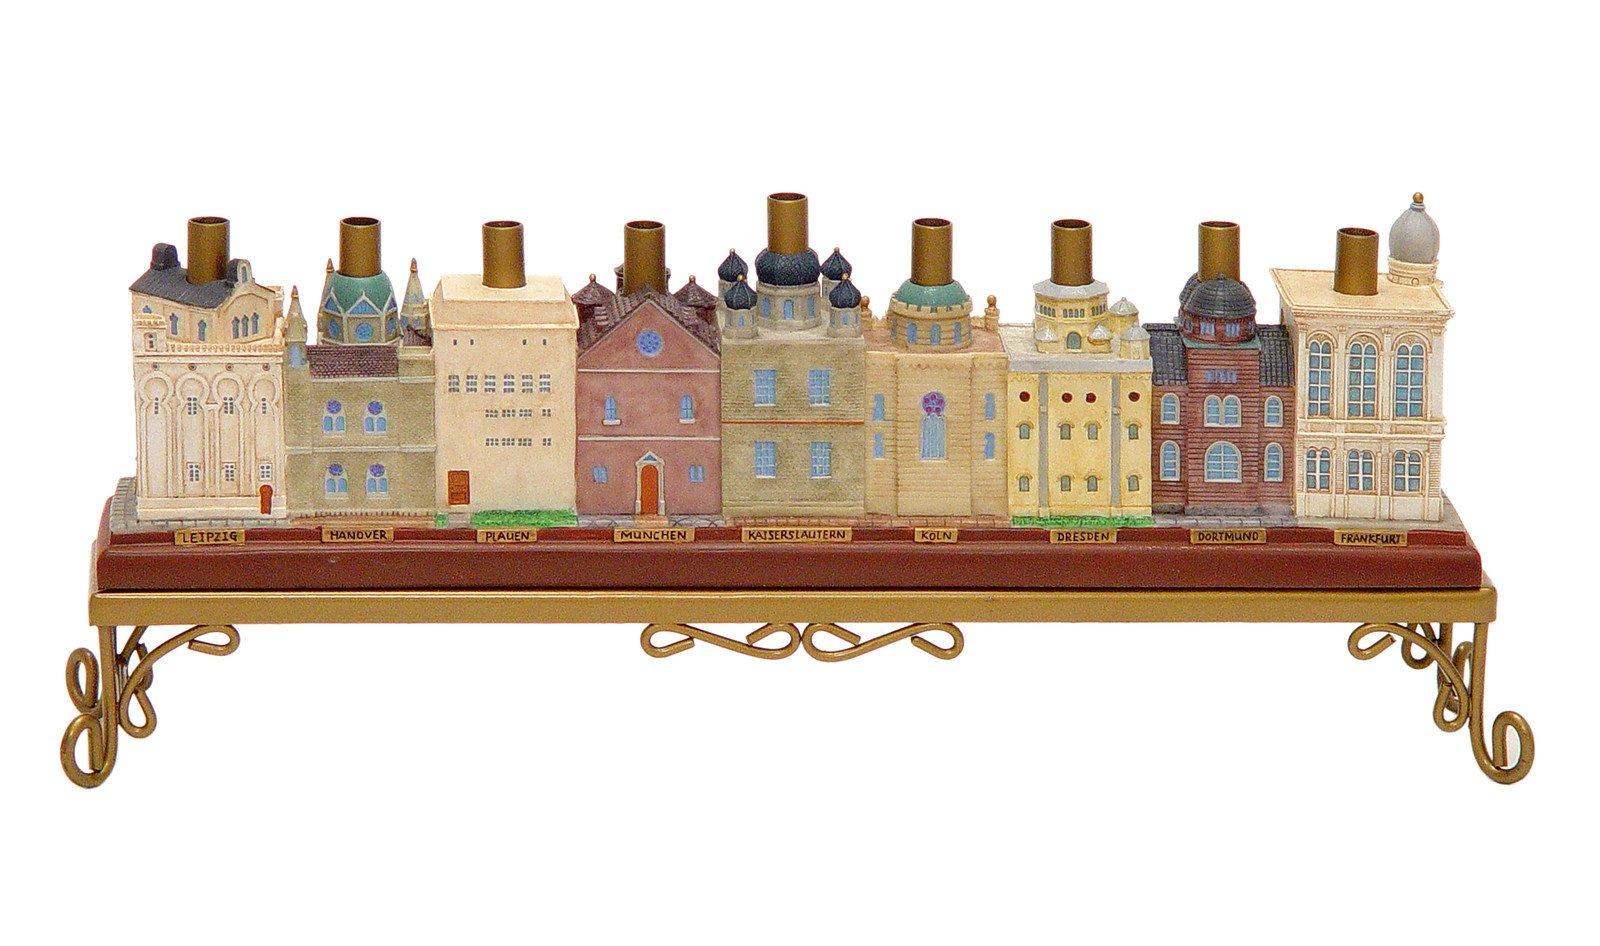 Hanukkah Menorah Collectors Unique Hanukkia ''The Lost Synagogues of Europe'' . Jewish Art. Great Gift For; Shabbat Chanoka Rabbi Temple Wedding Baby Naming Housewarming Bar Mitzvah Bat Mitzva and Jewish Homes.